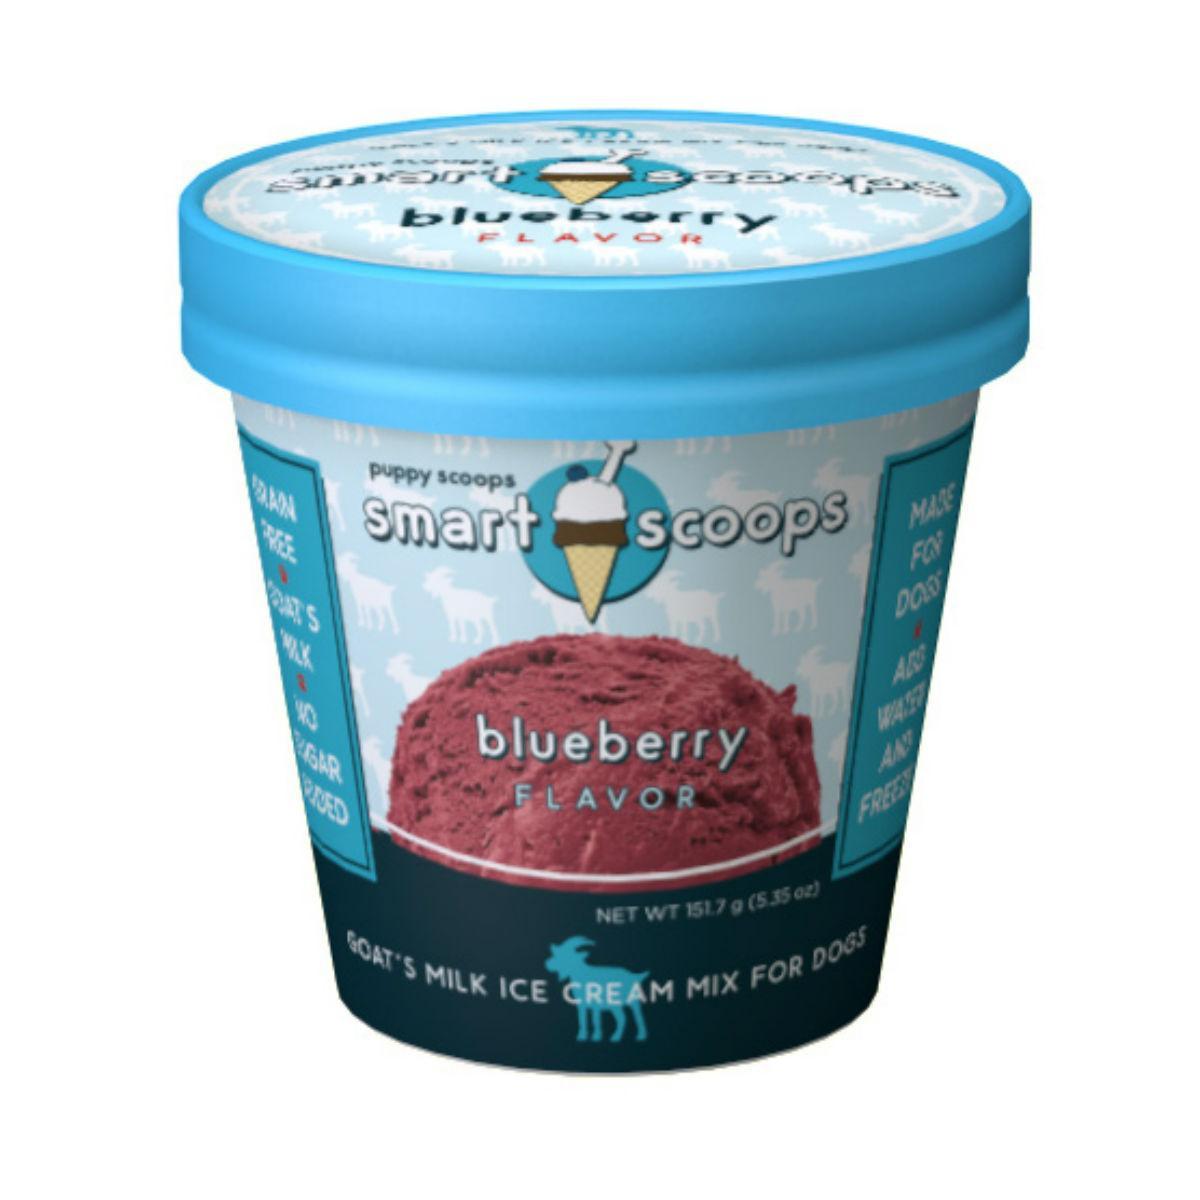 Puppy Scoops Ice Cream Mix - Blueberry